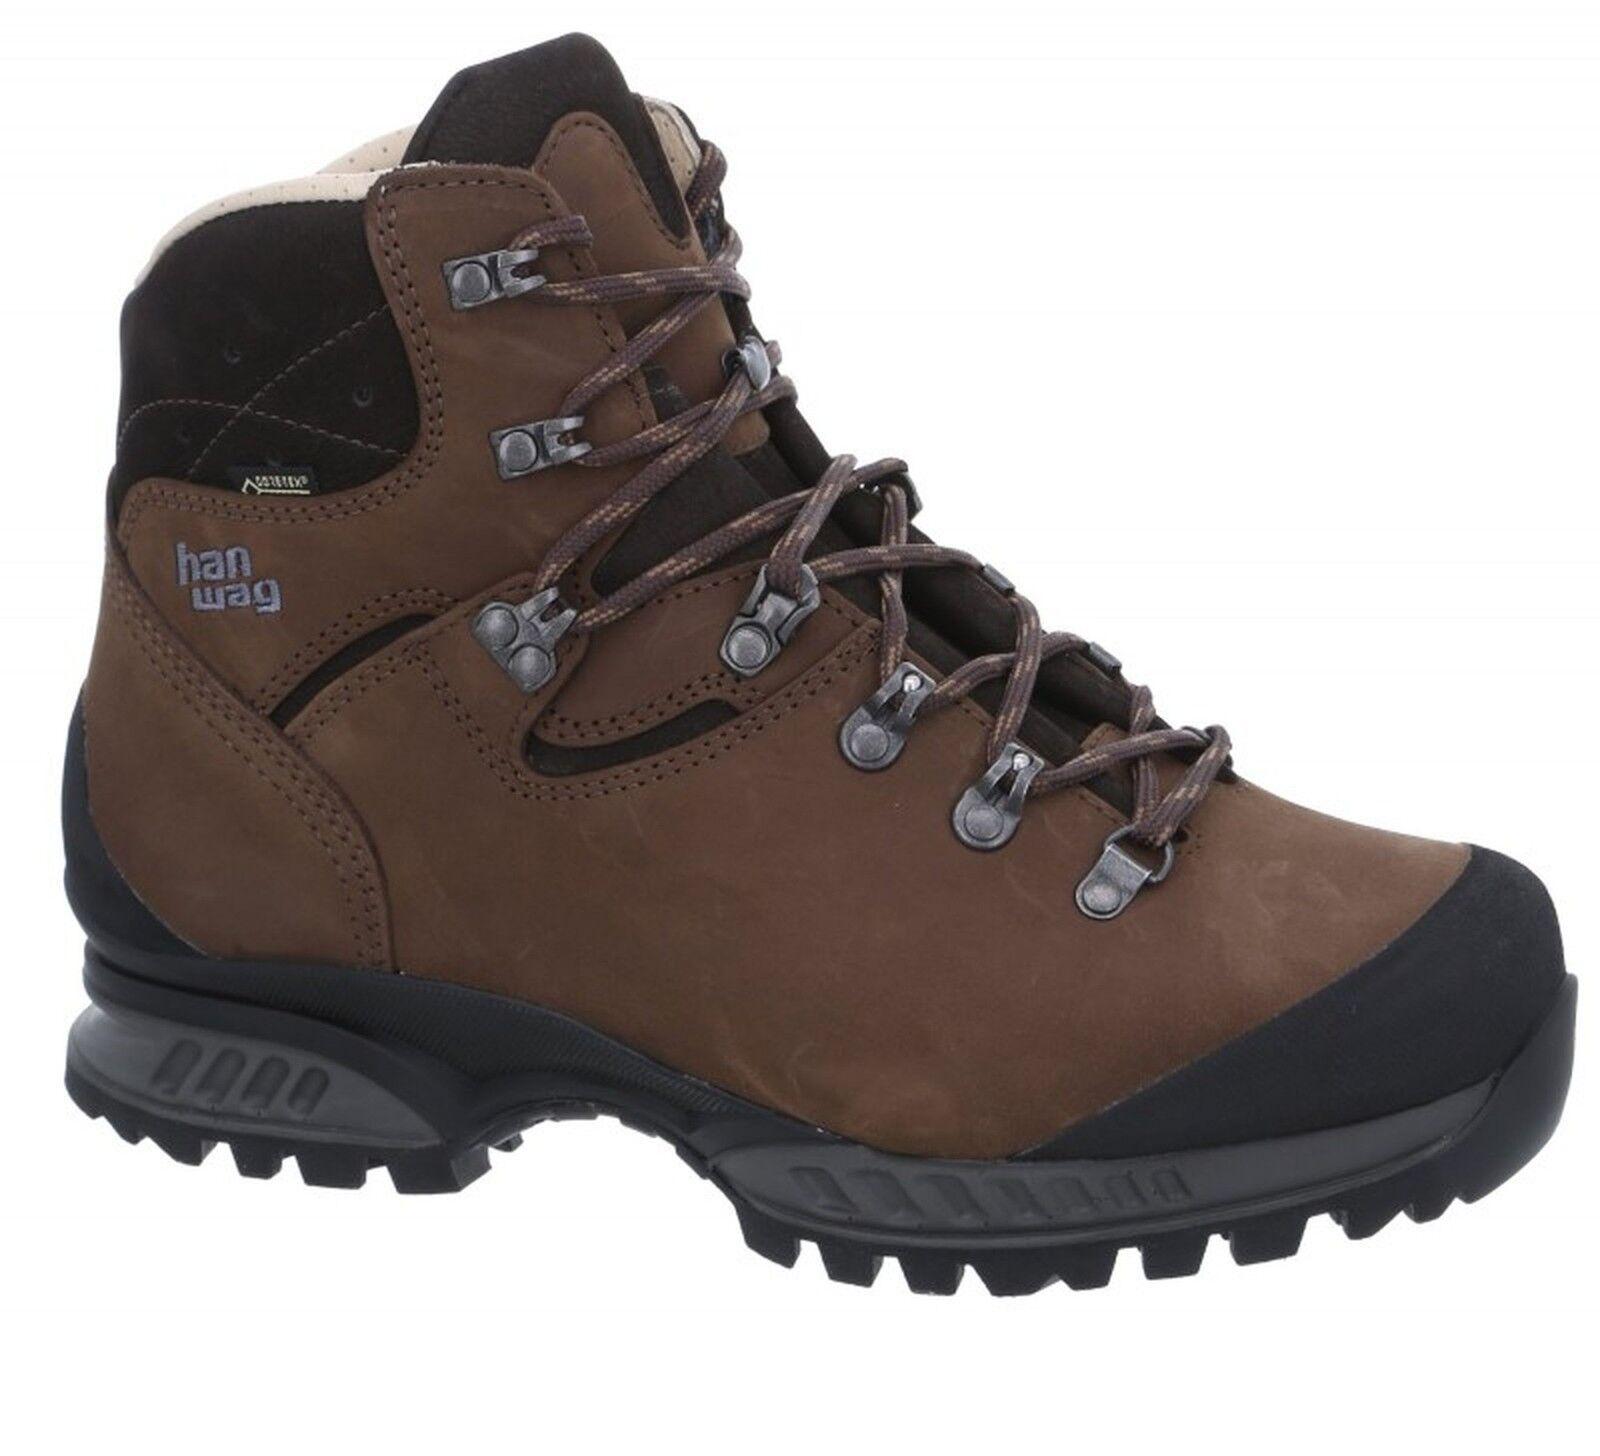 Hanwag Trekking shoes Tatra II Wide GTX Size 8,5 - 42,5